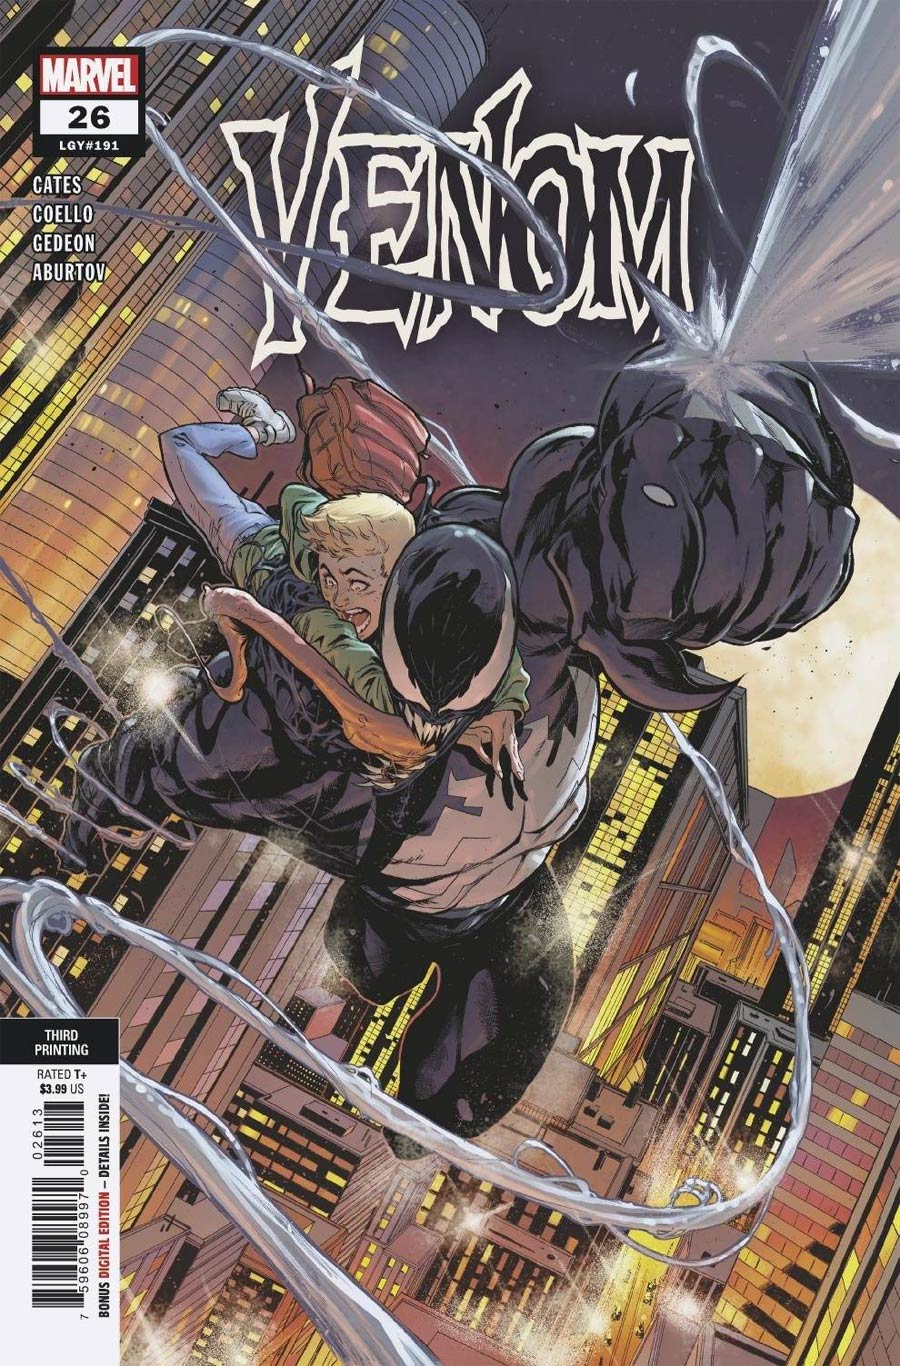 Venom Vol 4 #26 Cover F 3rd Ptg Variant Cover